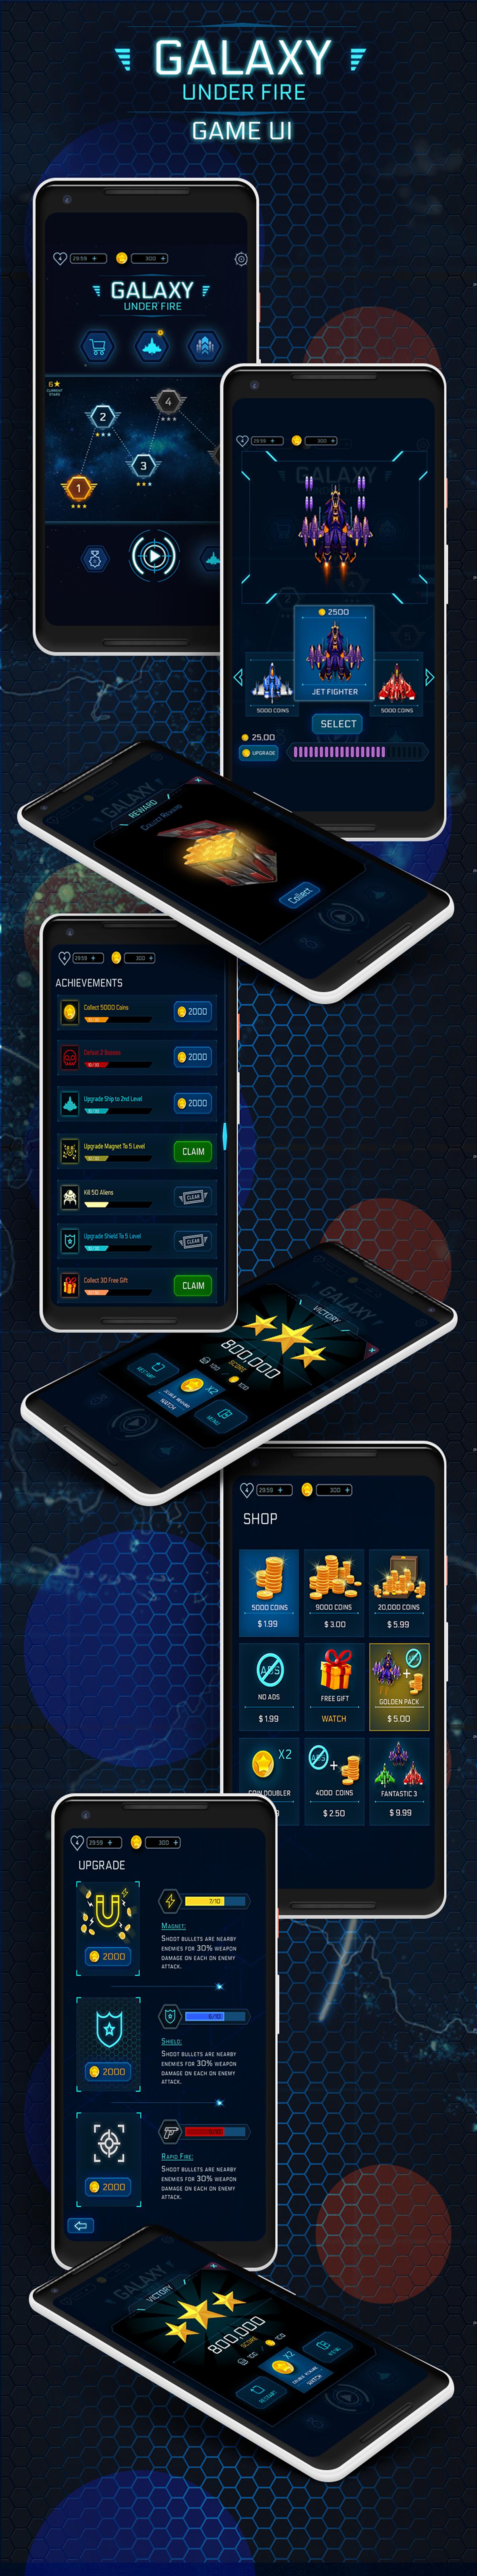 Galaxy Under Fire Game UI Design On Student Show - Game ui design